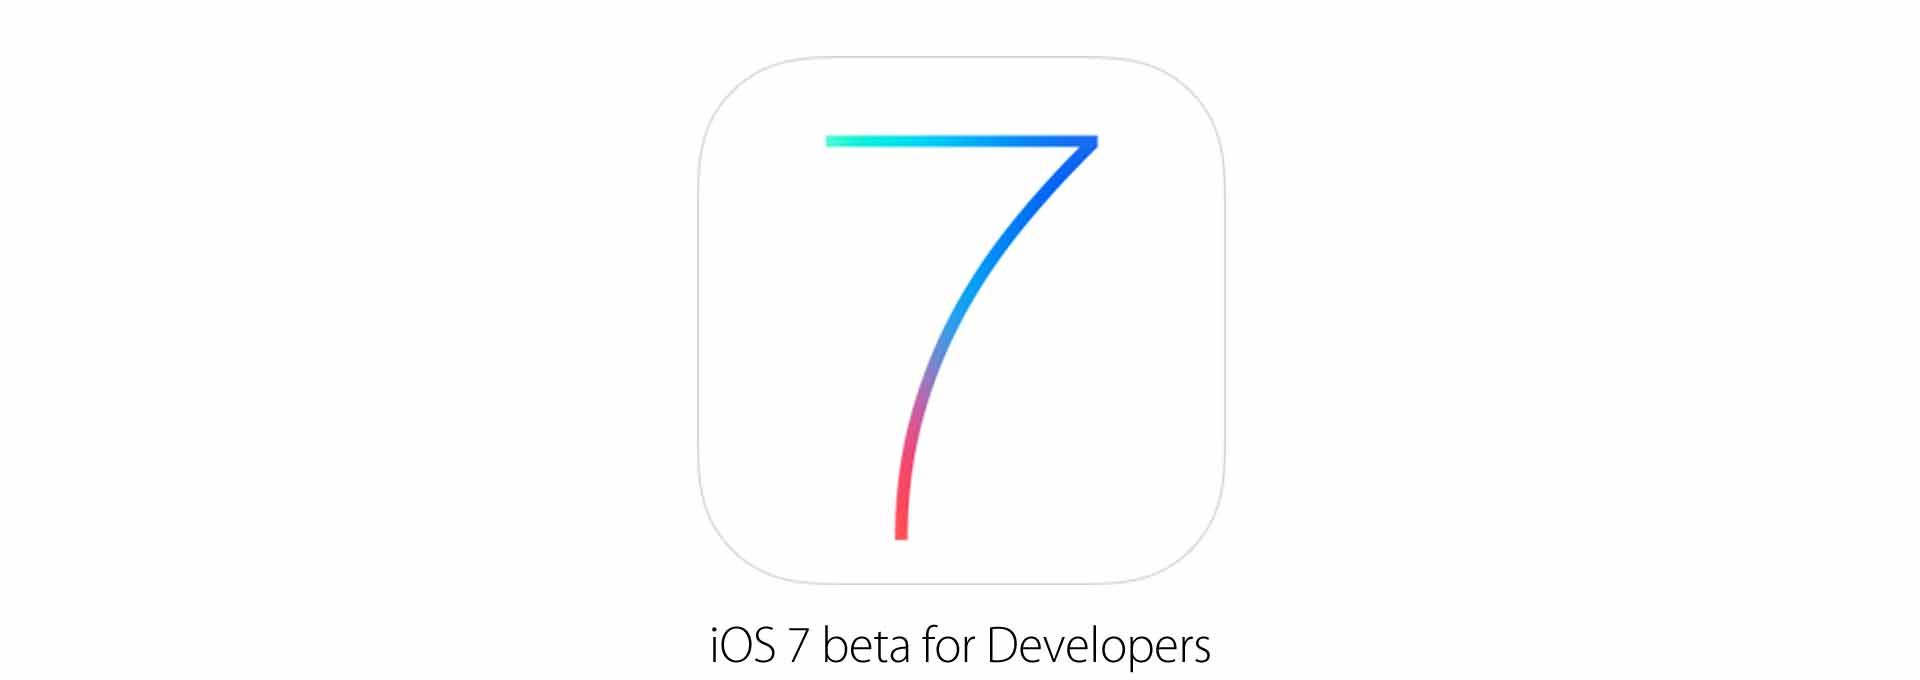 iOS 7 Beta: guide d'installation détaillé